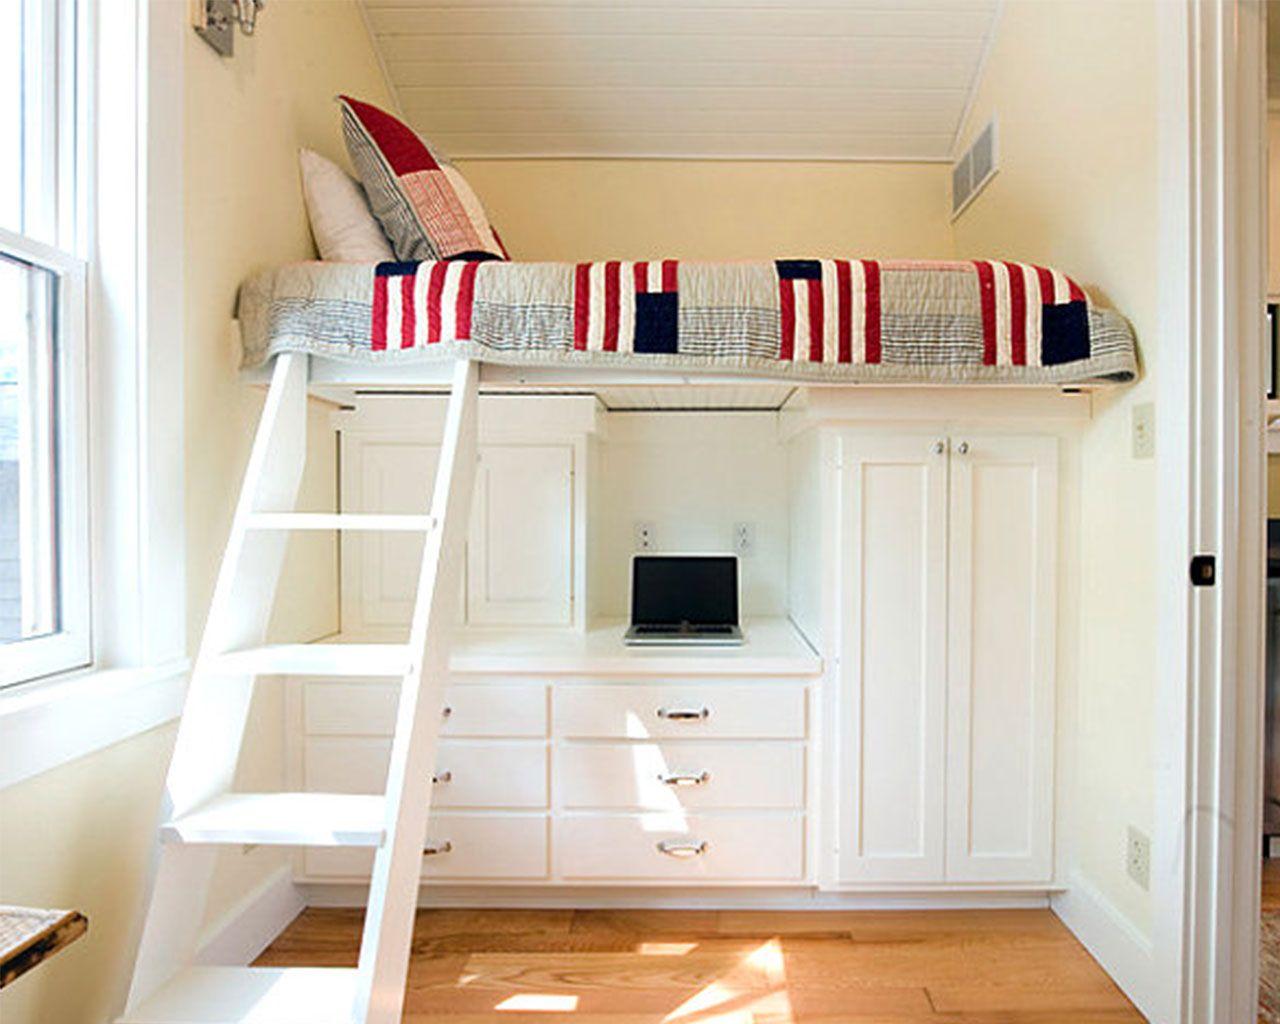 4 bedroom loft  LOVE this particular loft uc great website for ideas  Deco